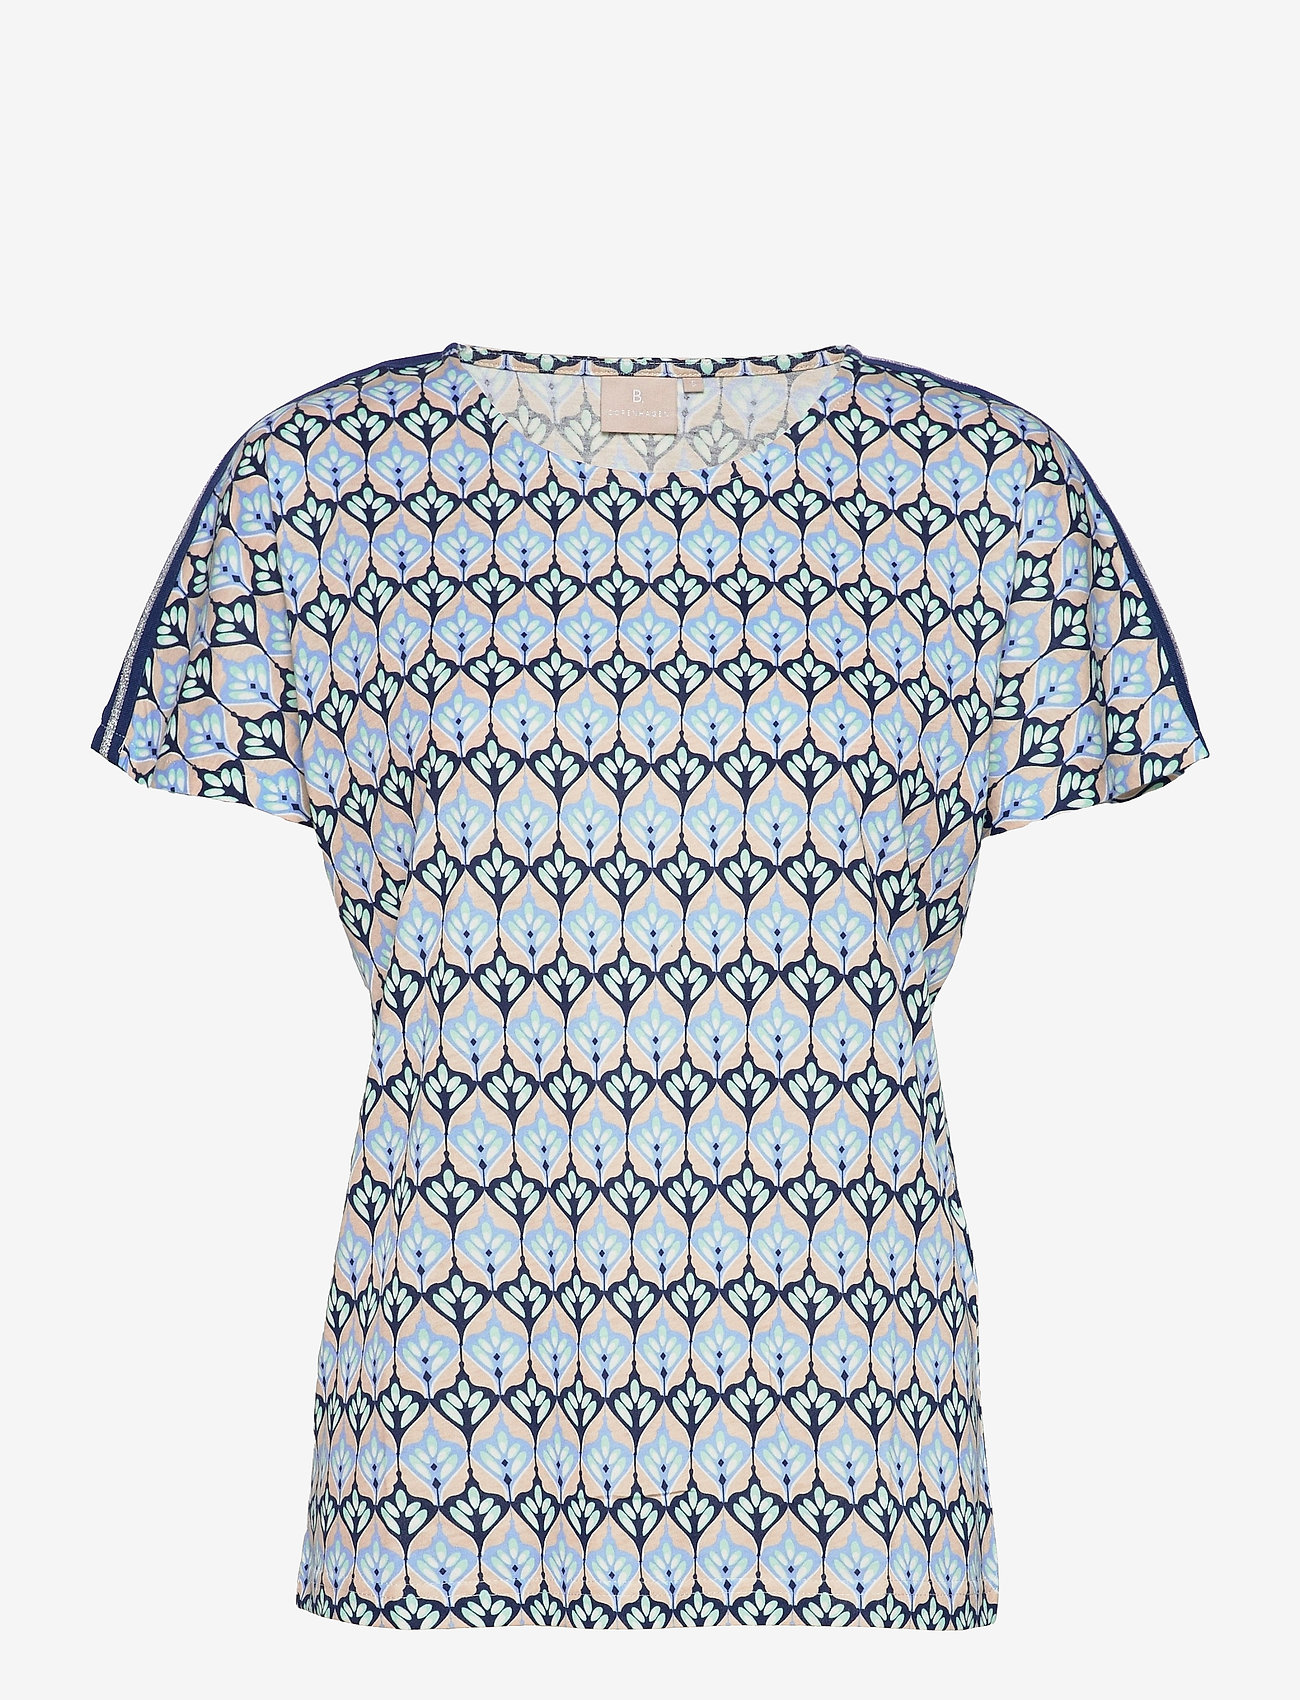 Brandtex - T-shirt s/s - t-shirts - serenity blue - 0